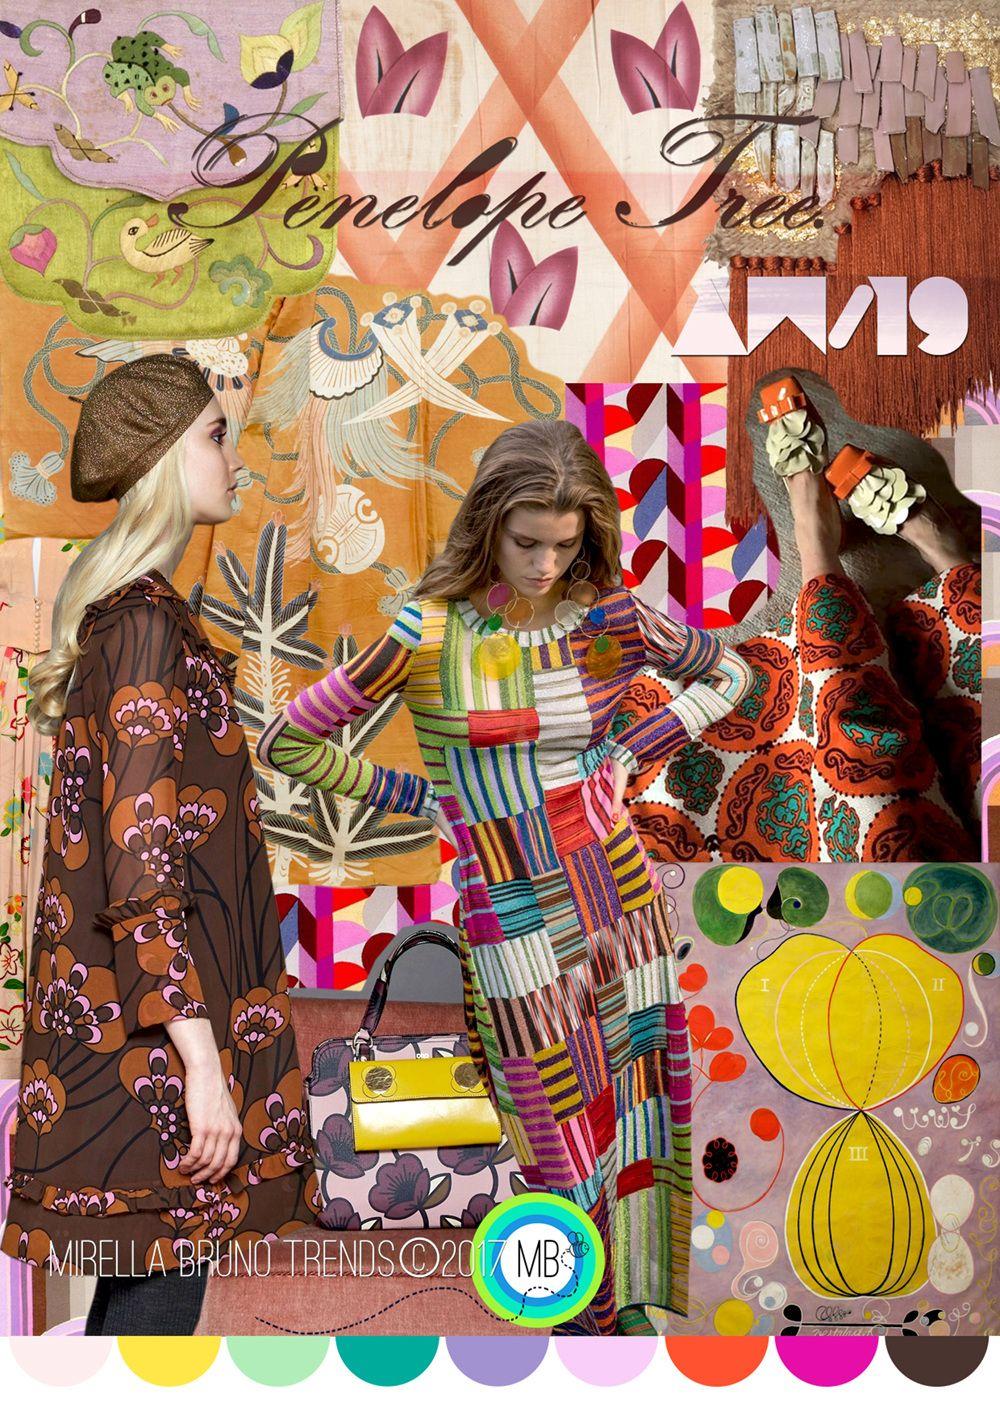 Penelope Tree AW/19 - Mirella Bruno Print Pattern and ...